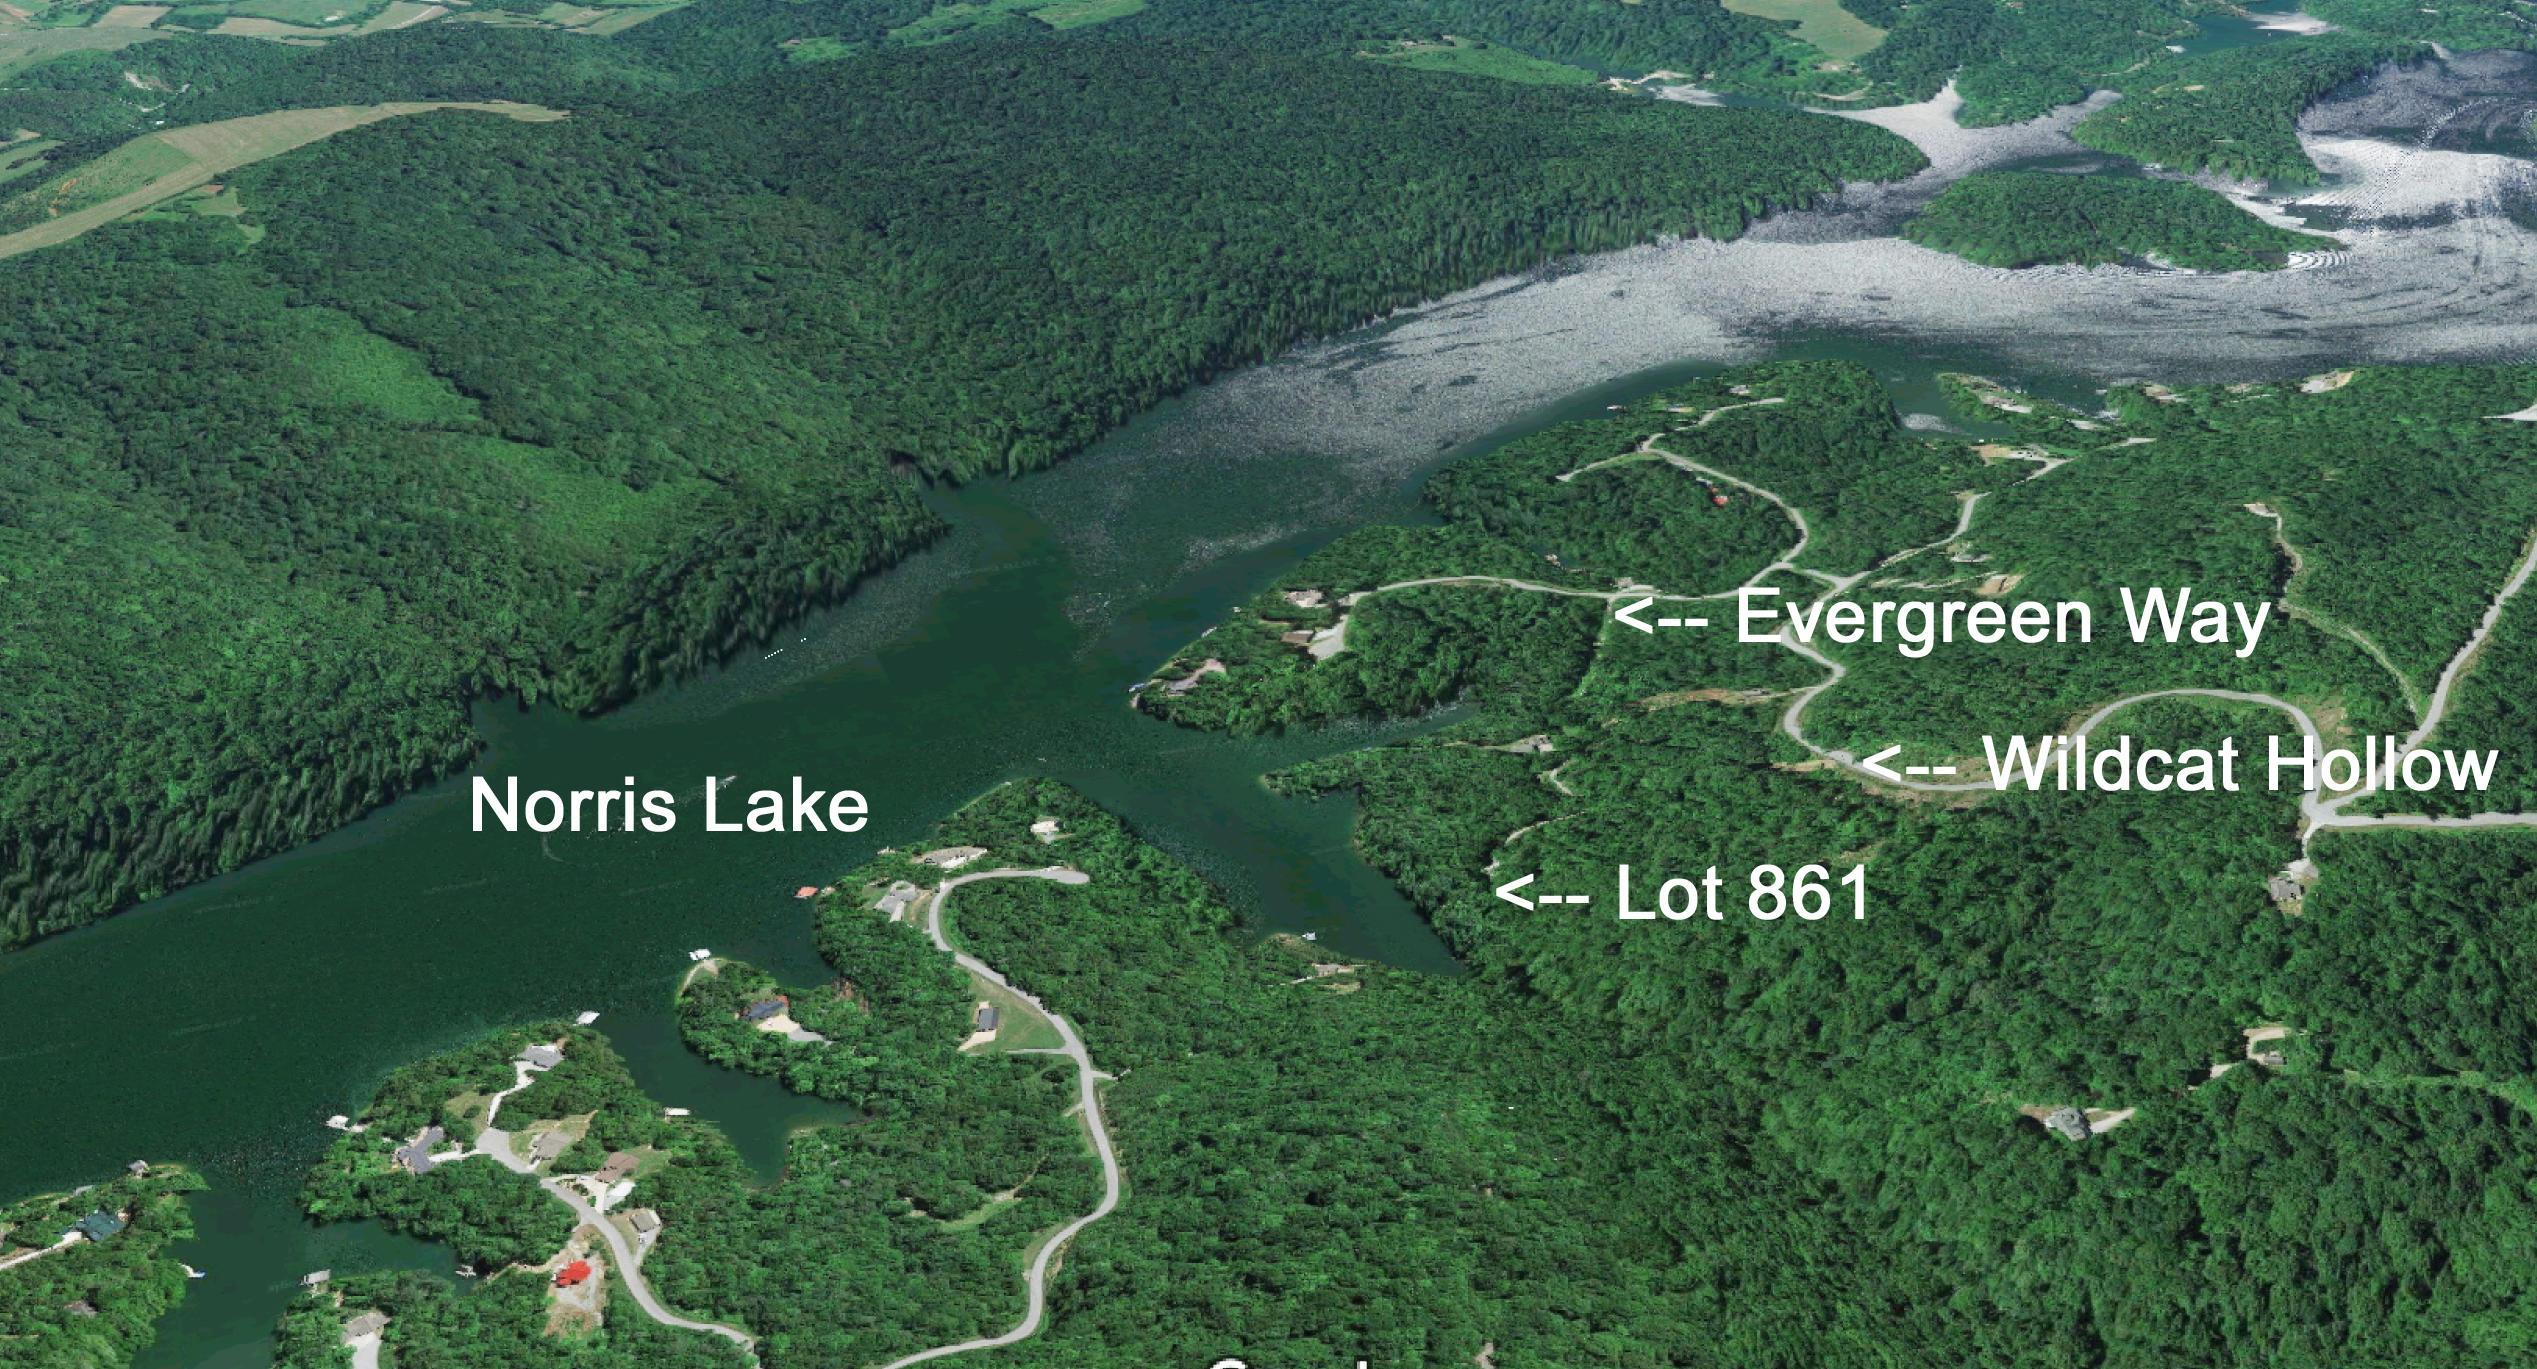 Lot 861 Evergreen Way: